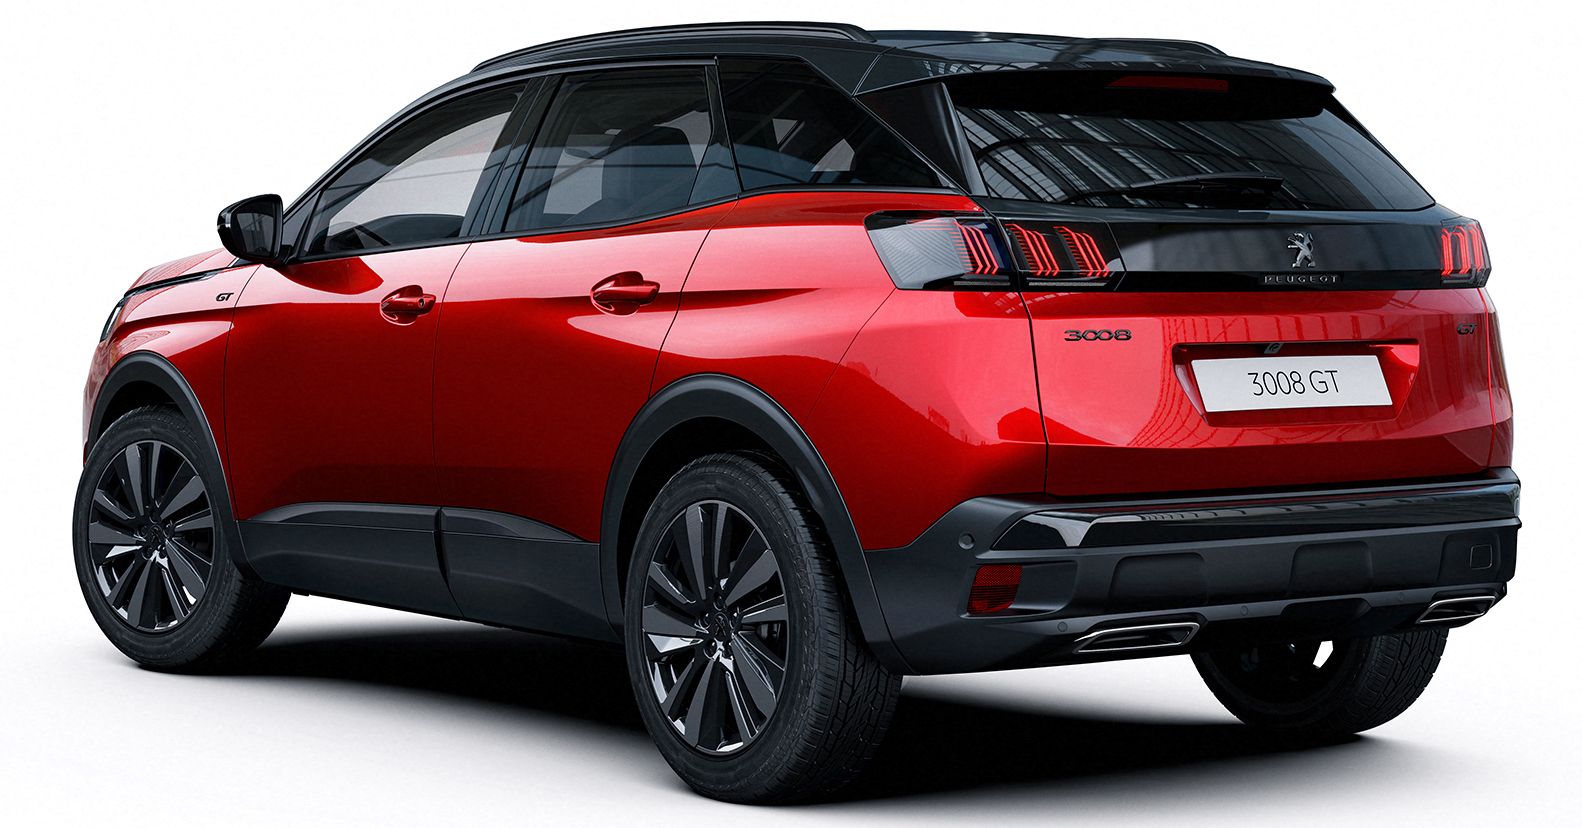 2021-Peugeot-3008-Facelift-Extra-Pics-7.jpg